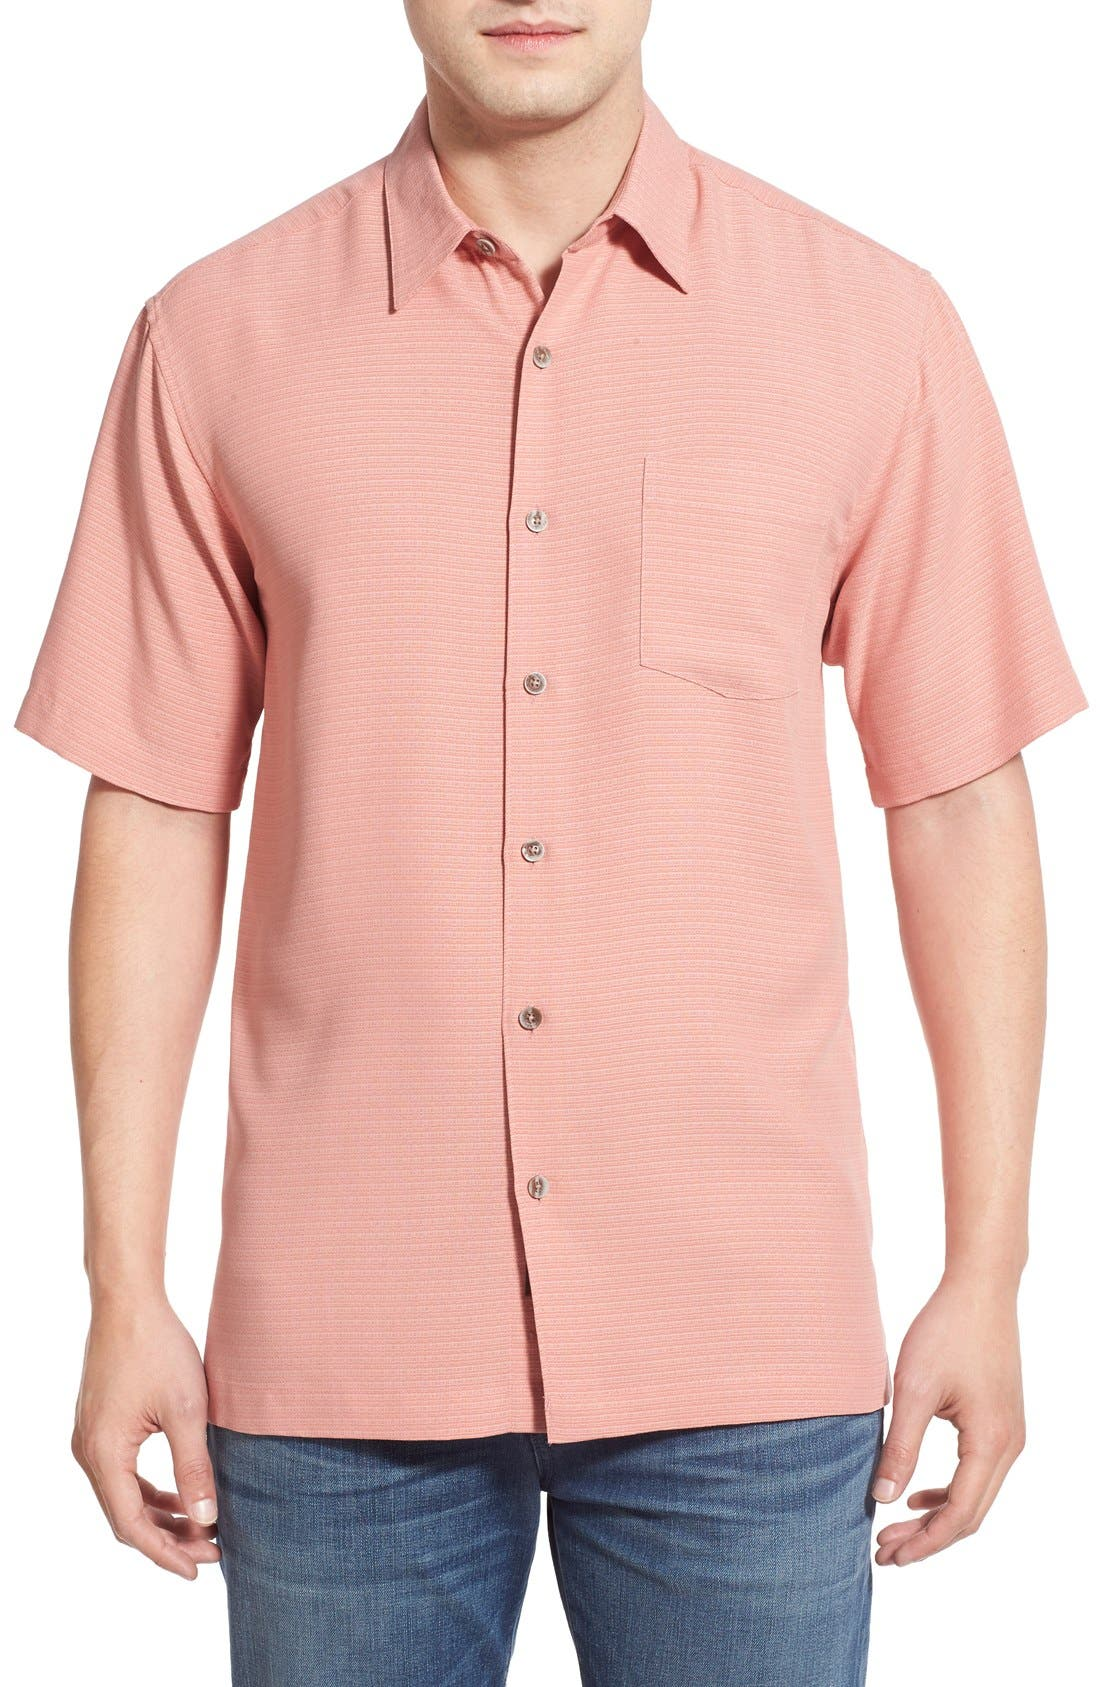 'Wind N Sea' Regular Fit Sport Shirt,                             Main thumbnail 1, color,                             Coral